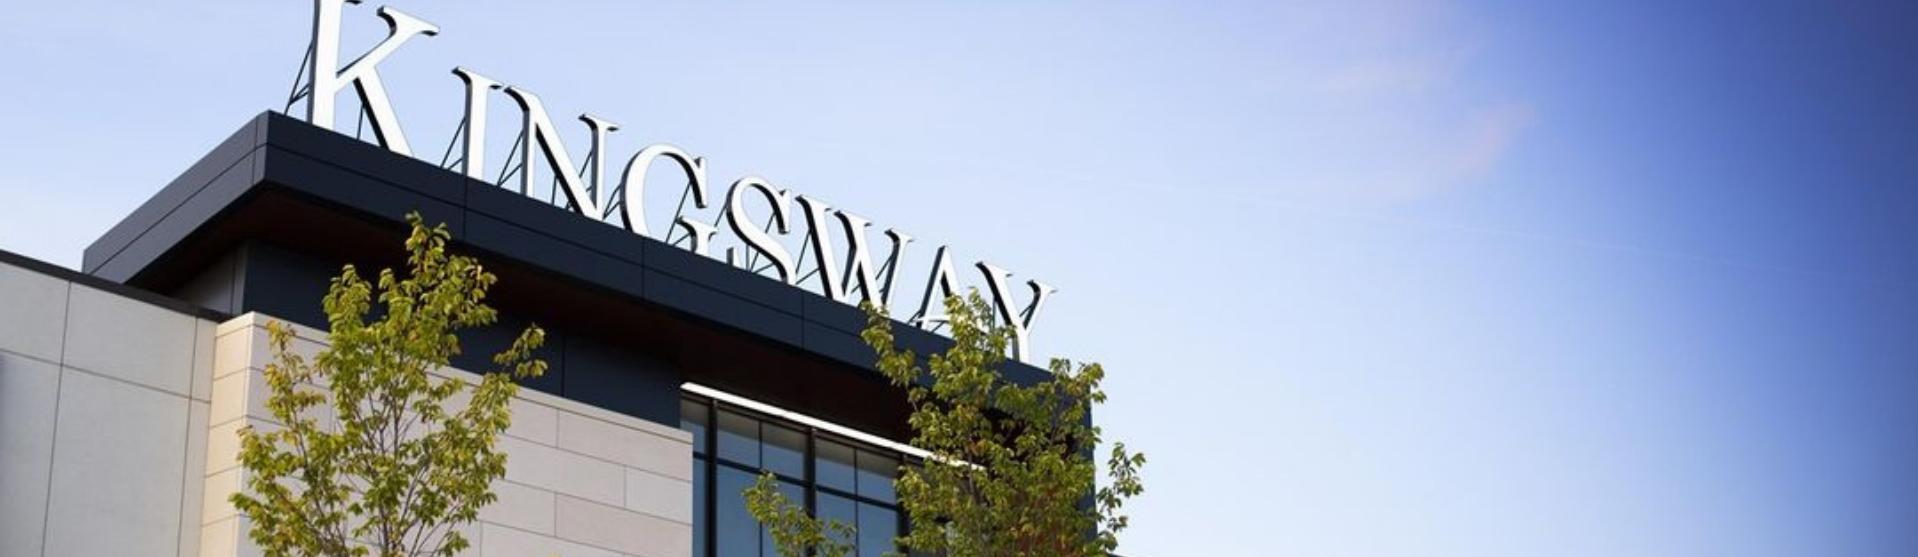 Exterior shot of Kingsway Entrance 8